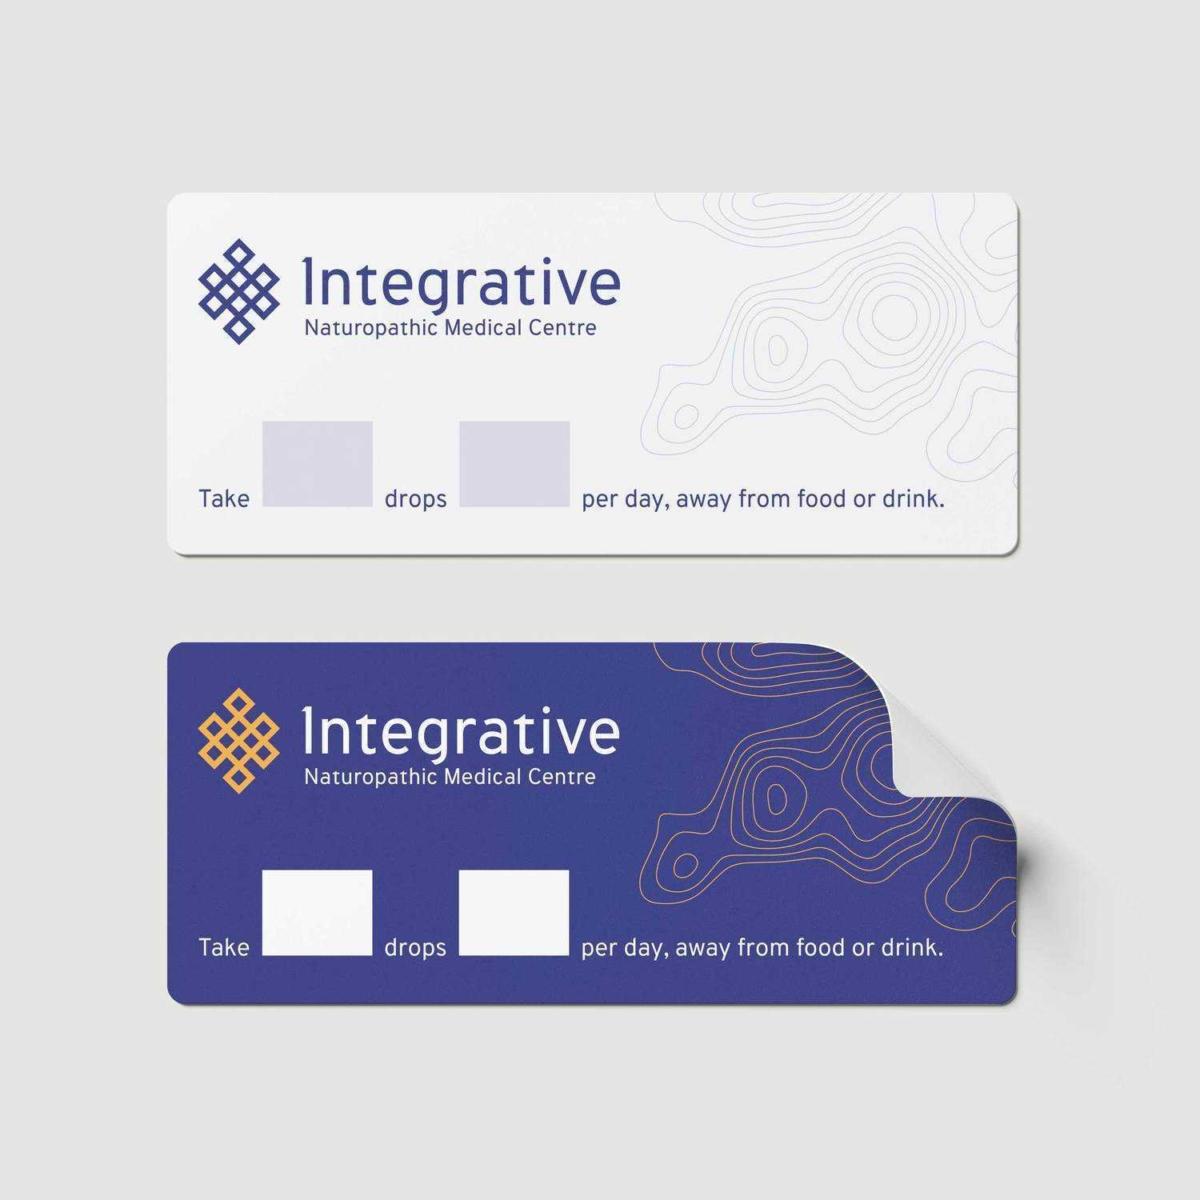 Integrative 45